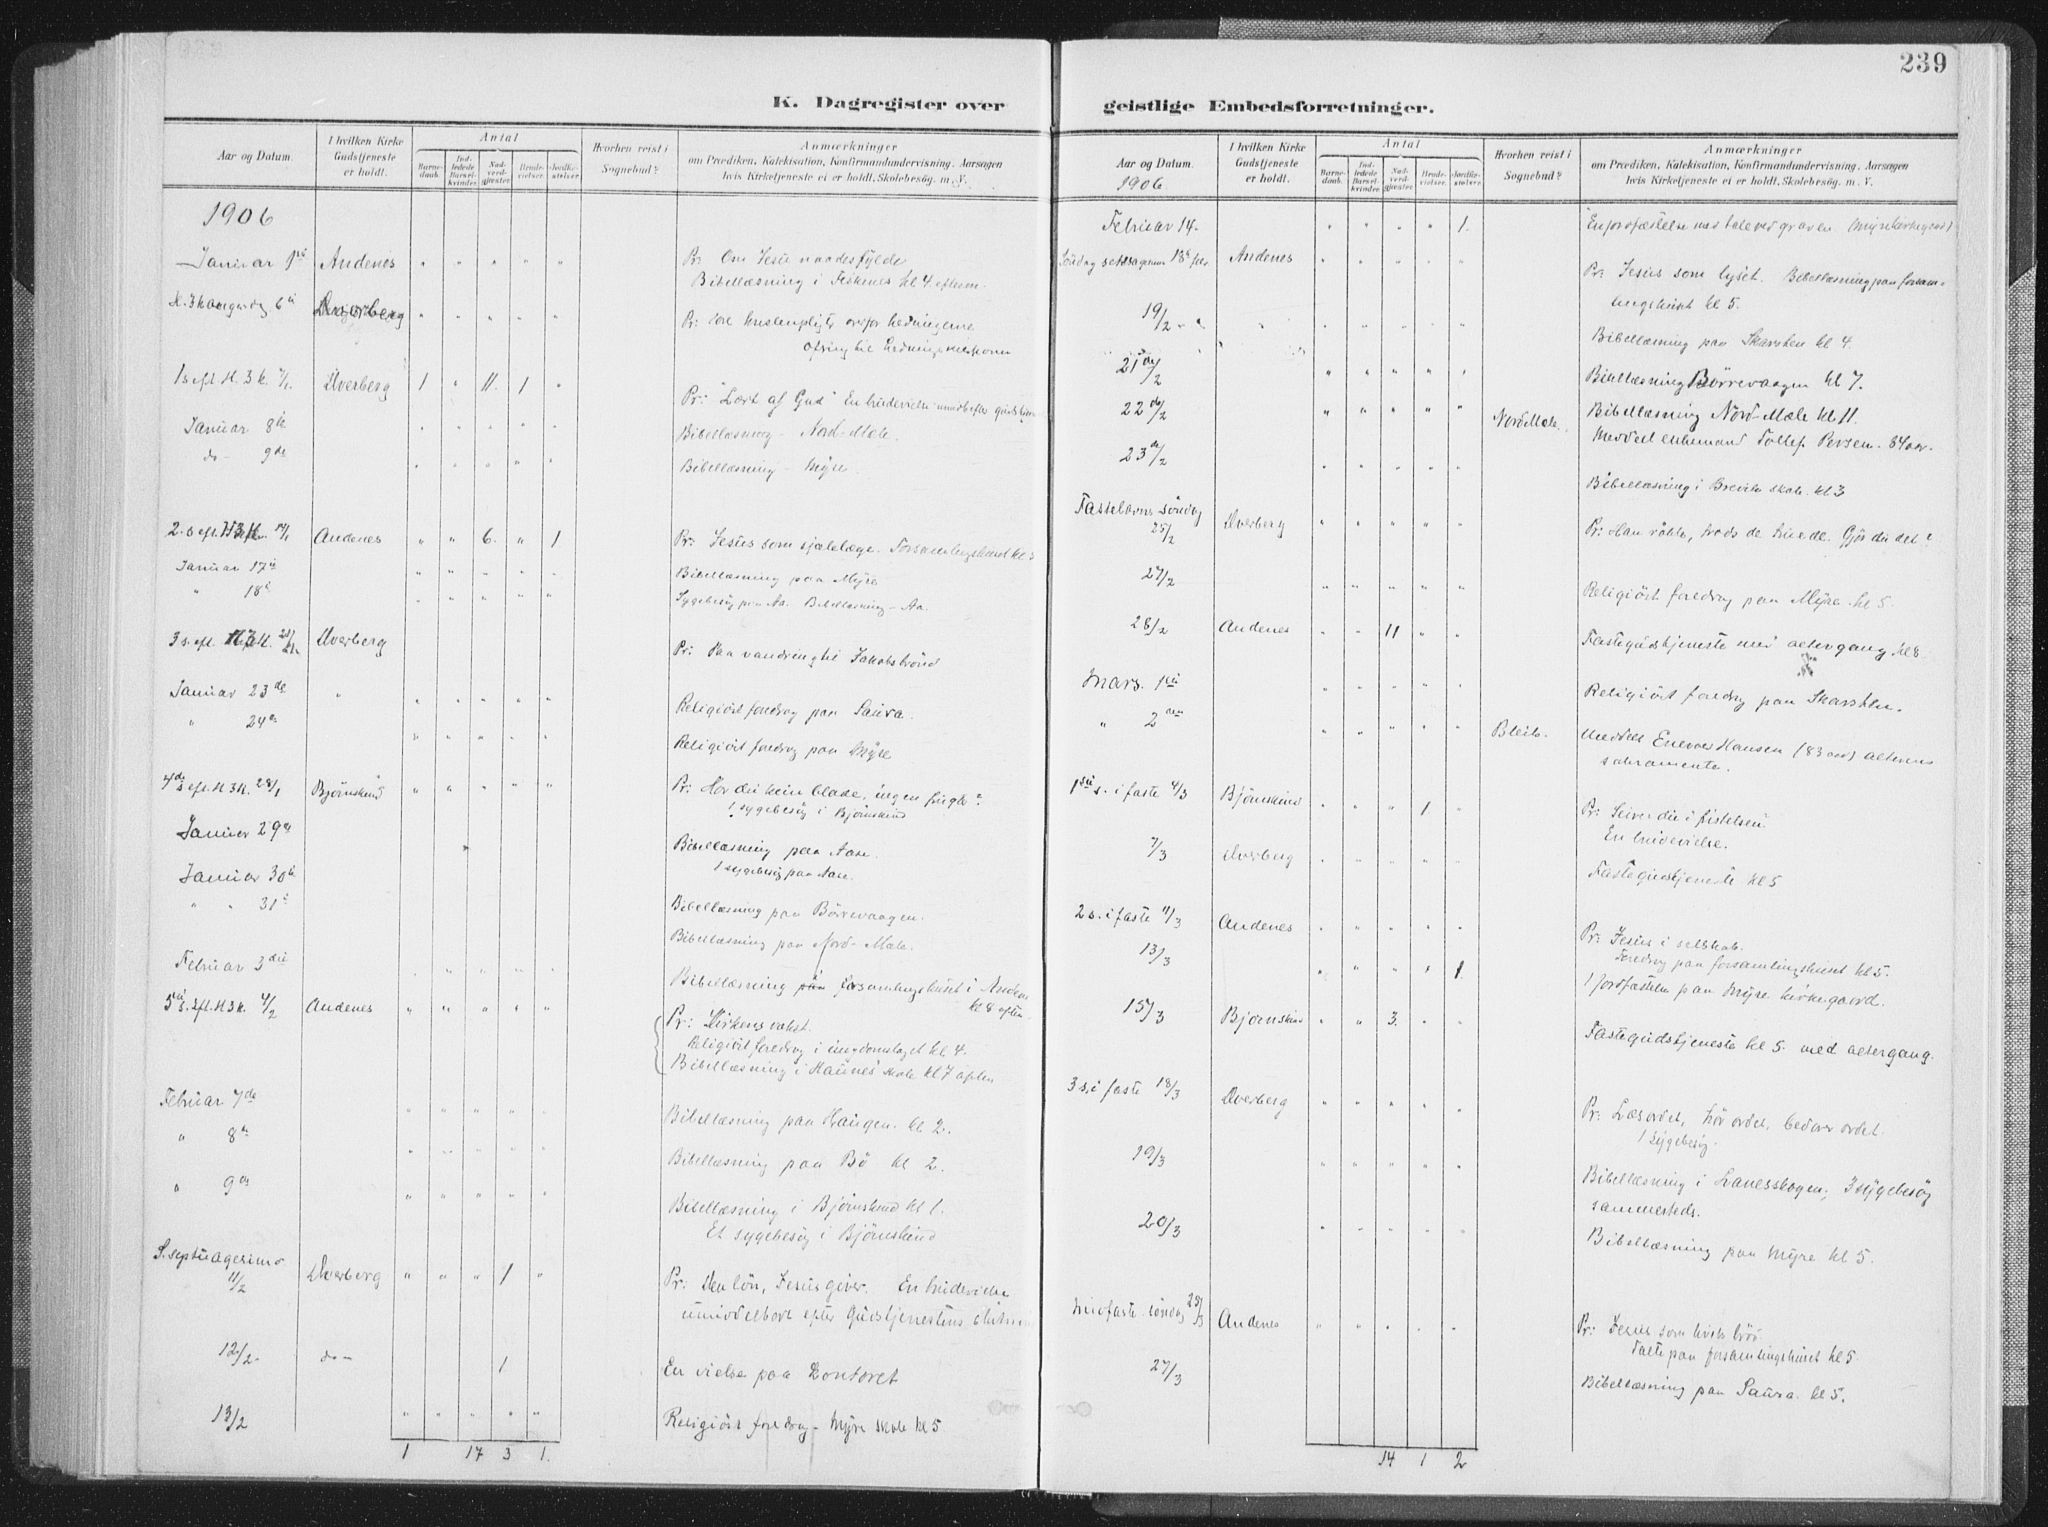 SAT, Ministerialprotokoller, klokkerbøker og fødselsregistre - Nordland, 897/L1400: Ministerialbok nr. 897A07, 1897-1908, s. 239